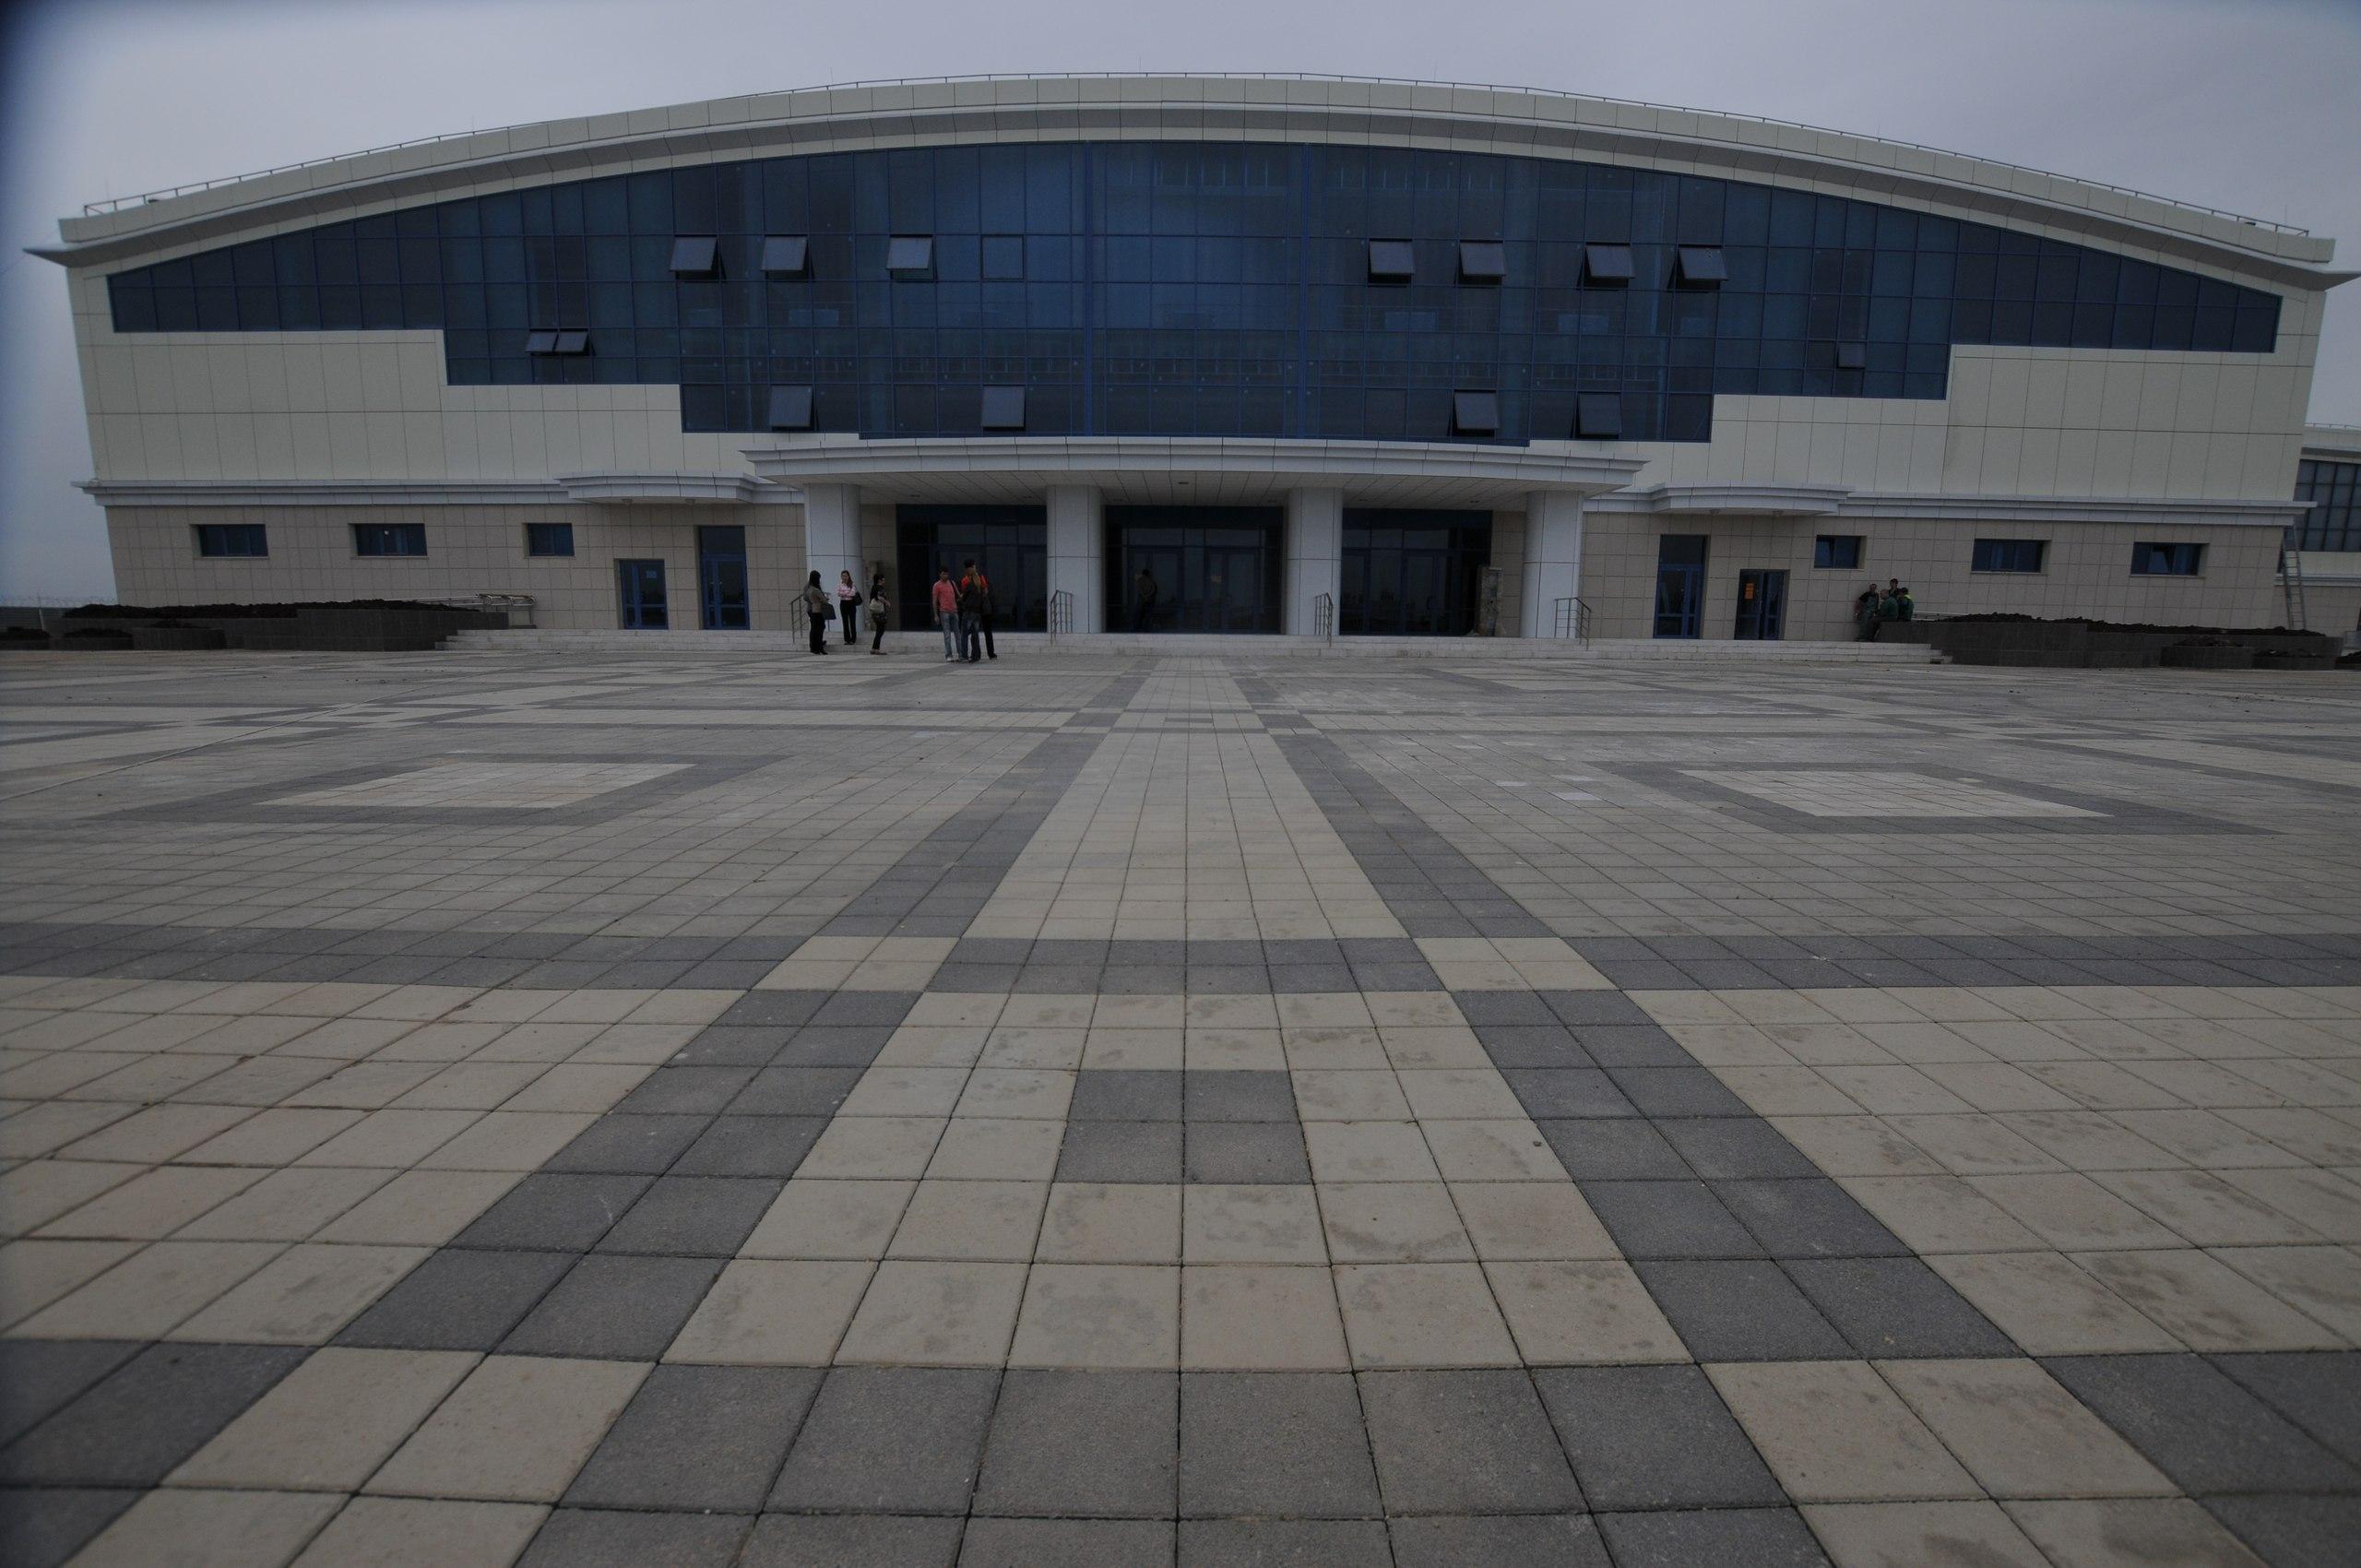 Арена холл краснодар фото